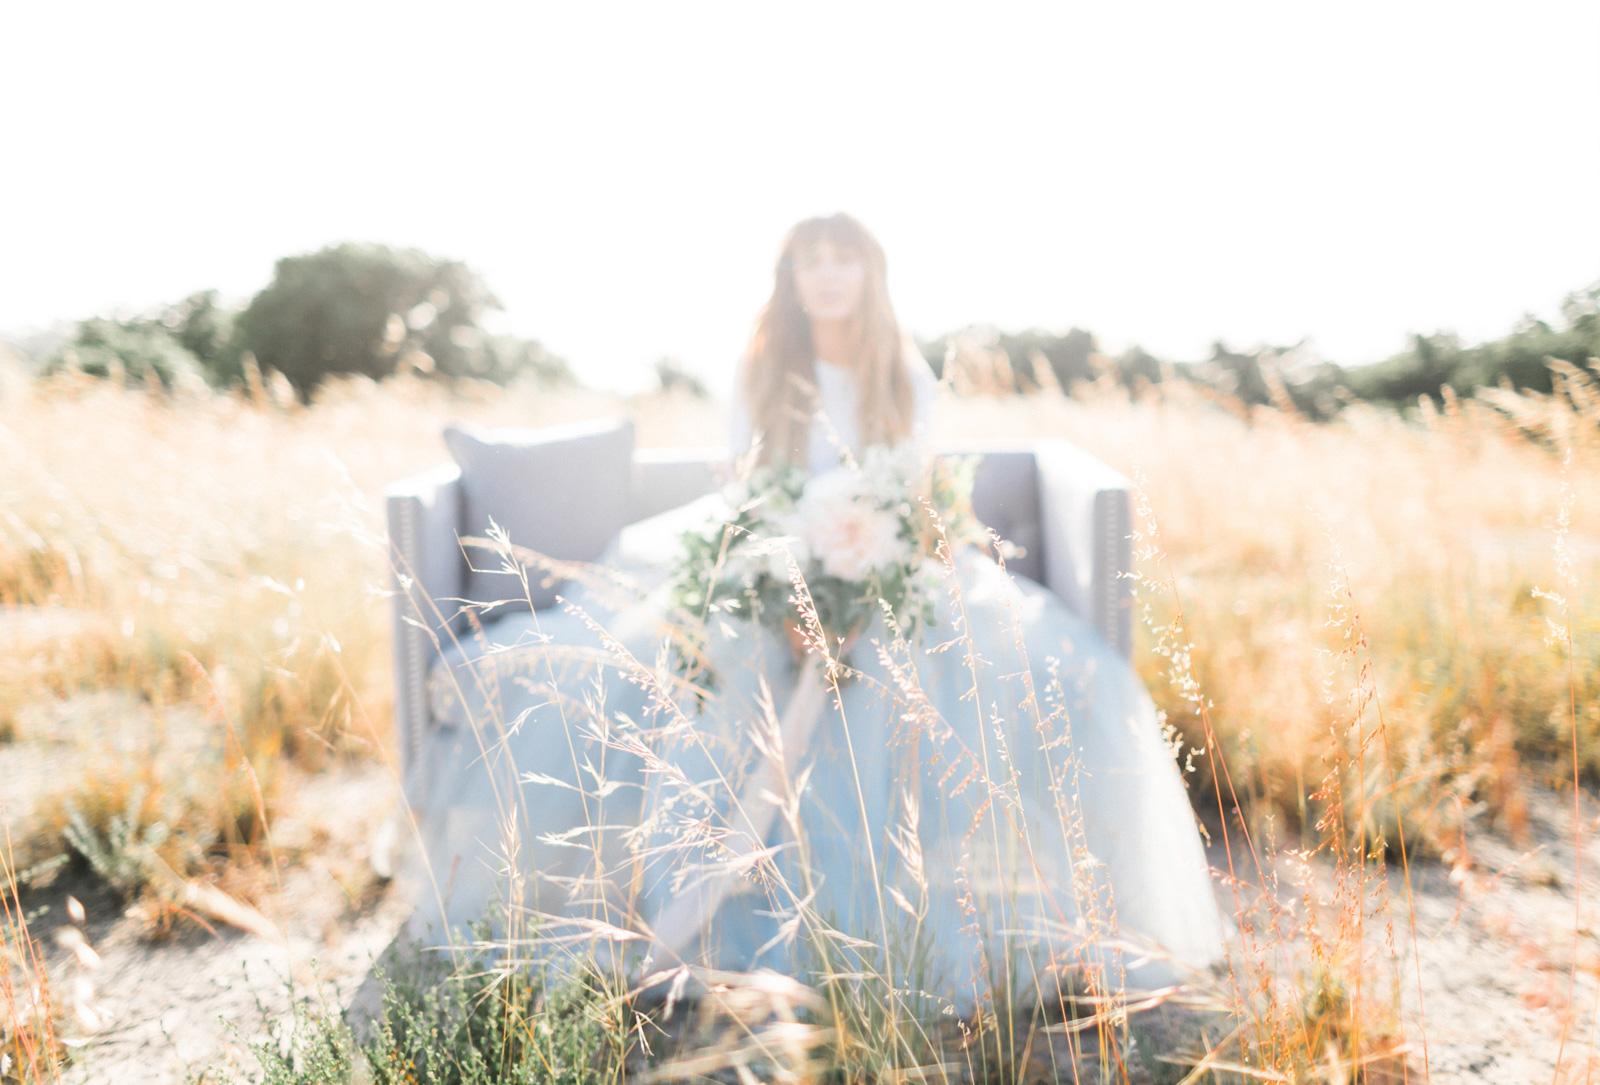 San-Luis-Obispo-Wedding-Photographer-Natalie-Schutt-Photography_06.jpg